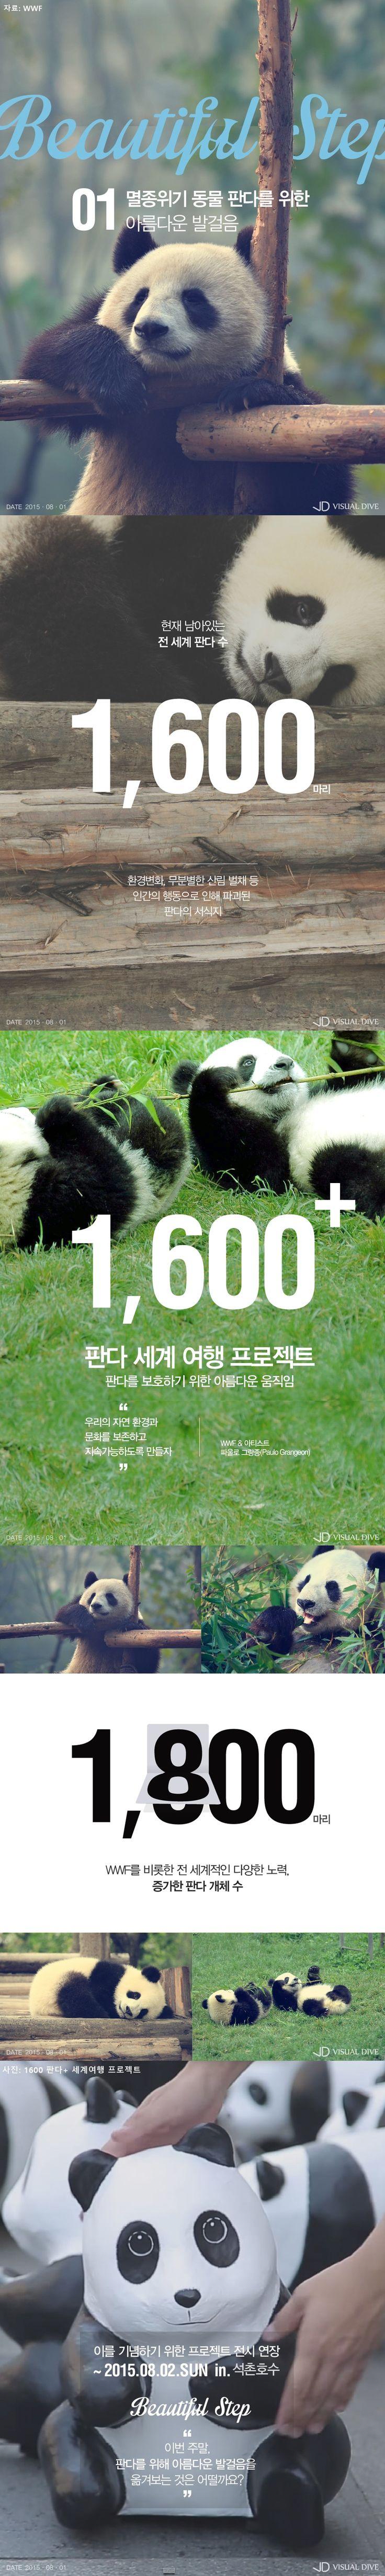 [Beautiful Step] 멸종위기 판다 위한 '1600 판다+ 프로젝트' [카드뉴스] #Panda / #Infographic ⓒ 비주얼다이브 무단 복사·전재·재배포 금지